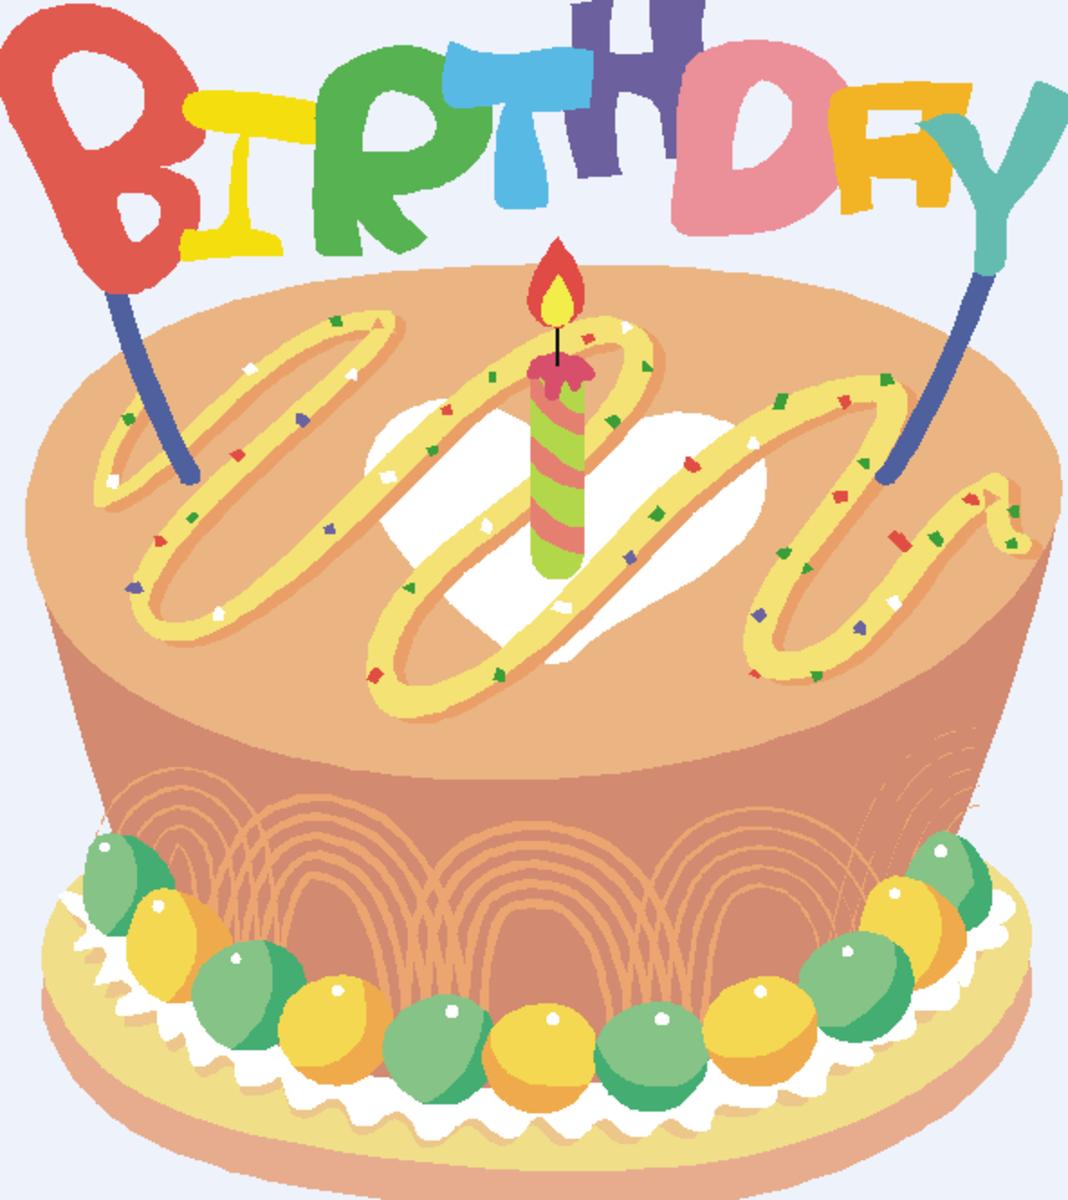 Chocolate Icing on Birthday Cake